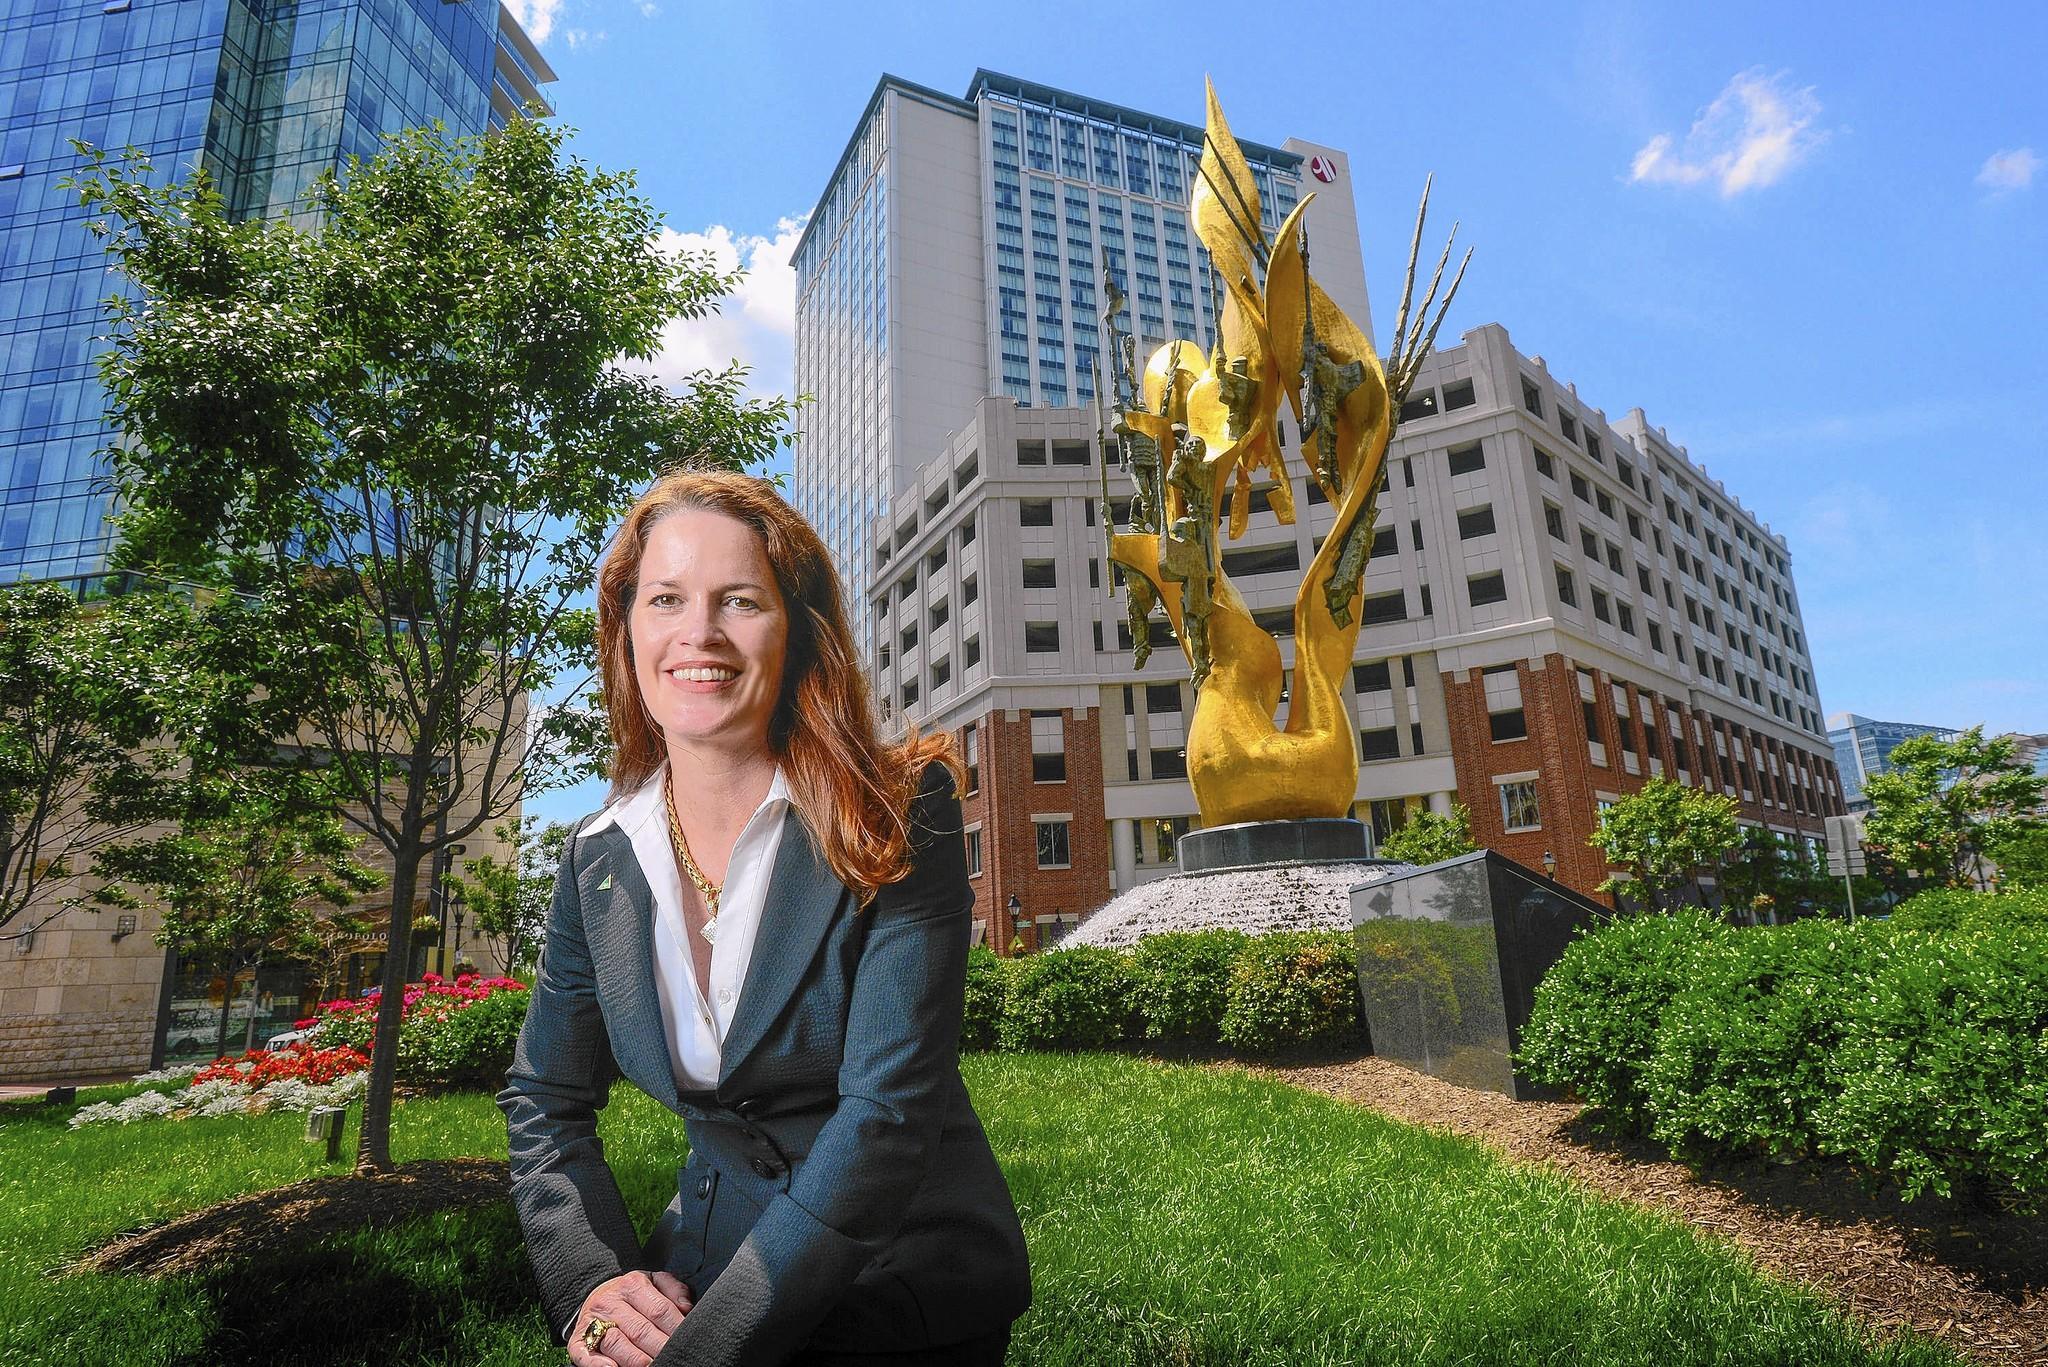 Kim Martini is director of business development for Armada Hoffler.